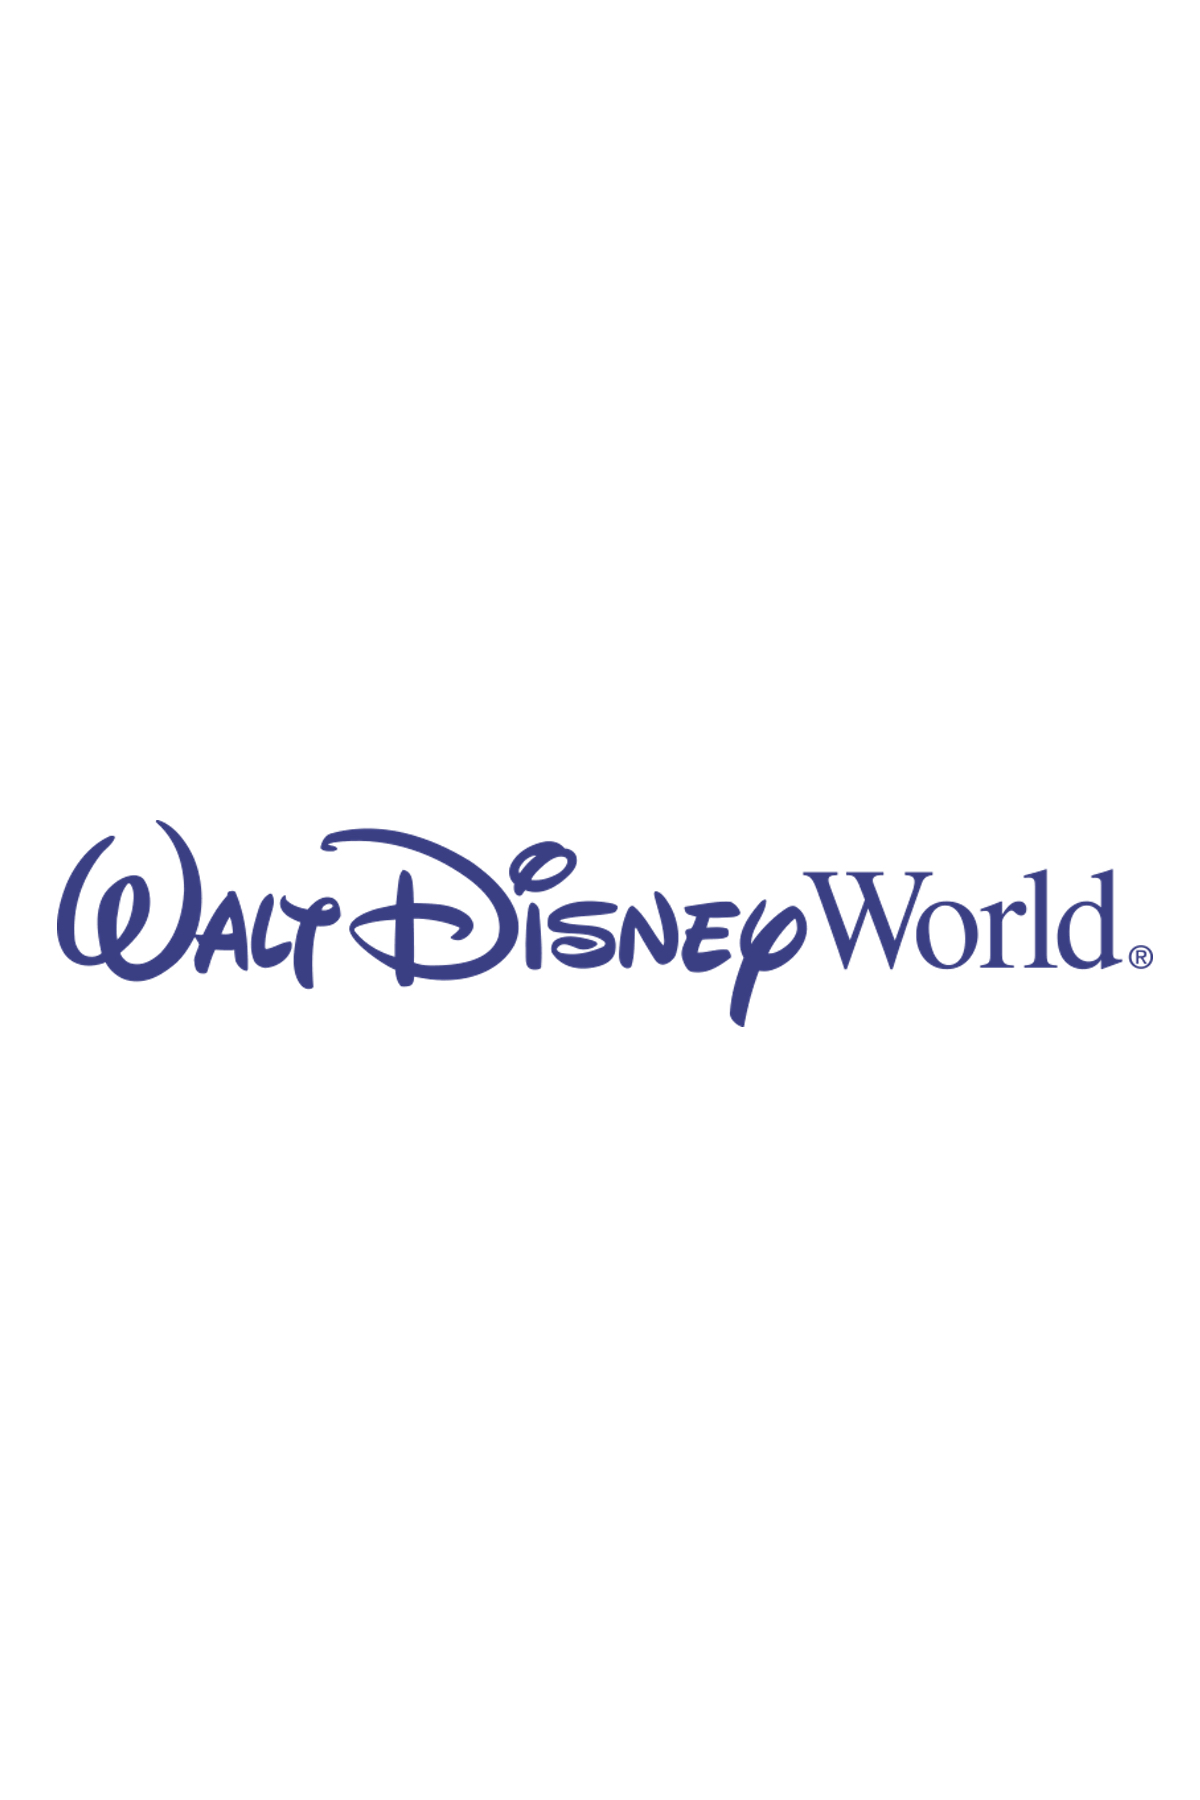 Disney Grid.jpg